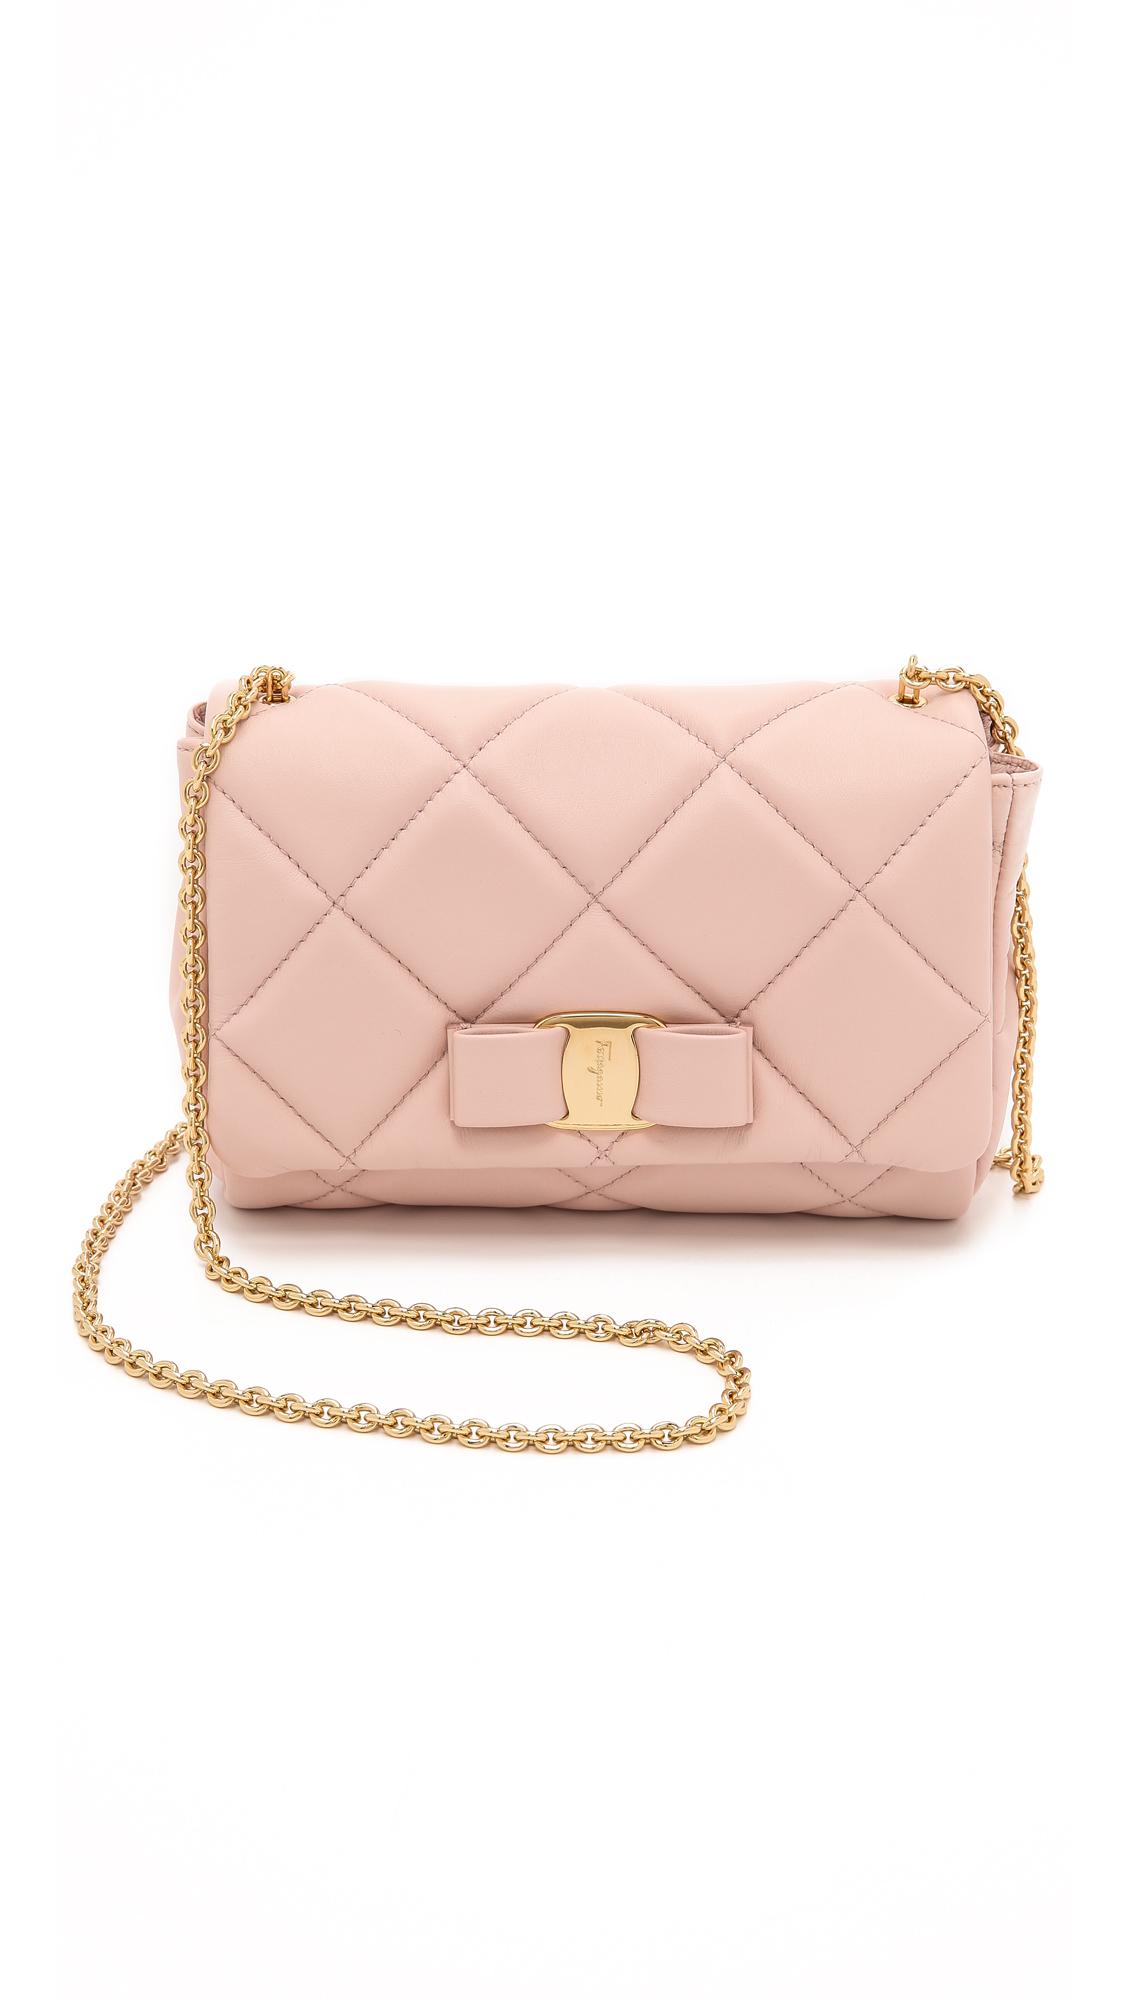 5be5aaa23377 Salvatore Ferragamo Miss Vara Quilted Mini Bag